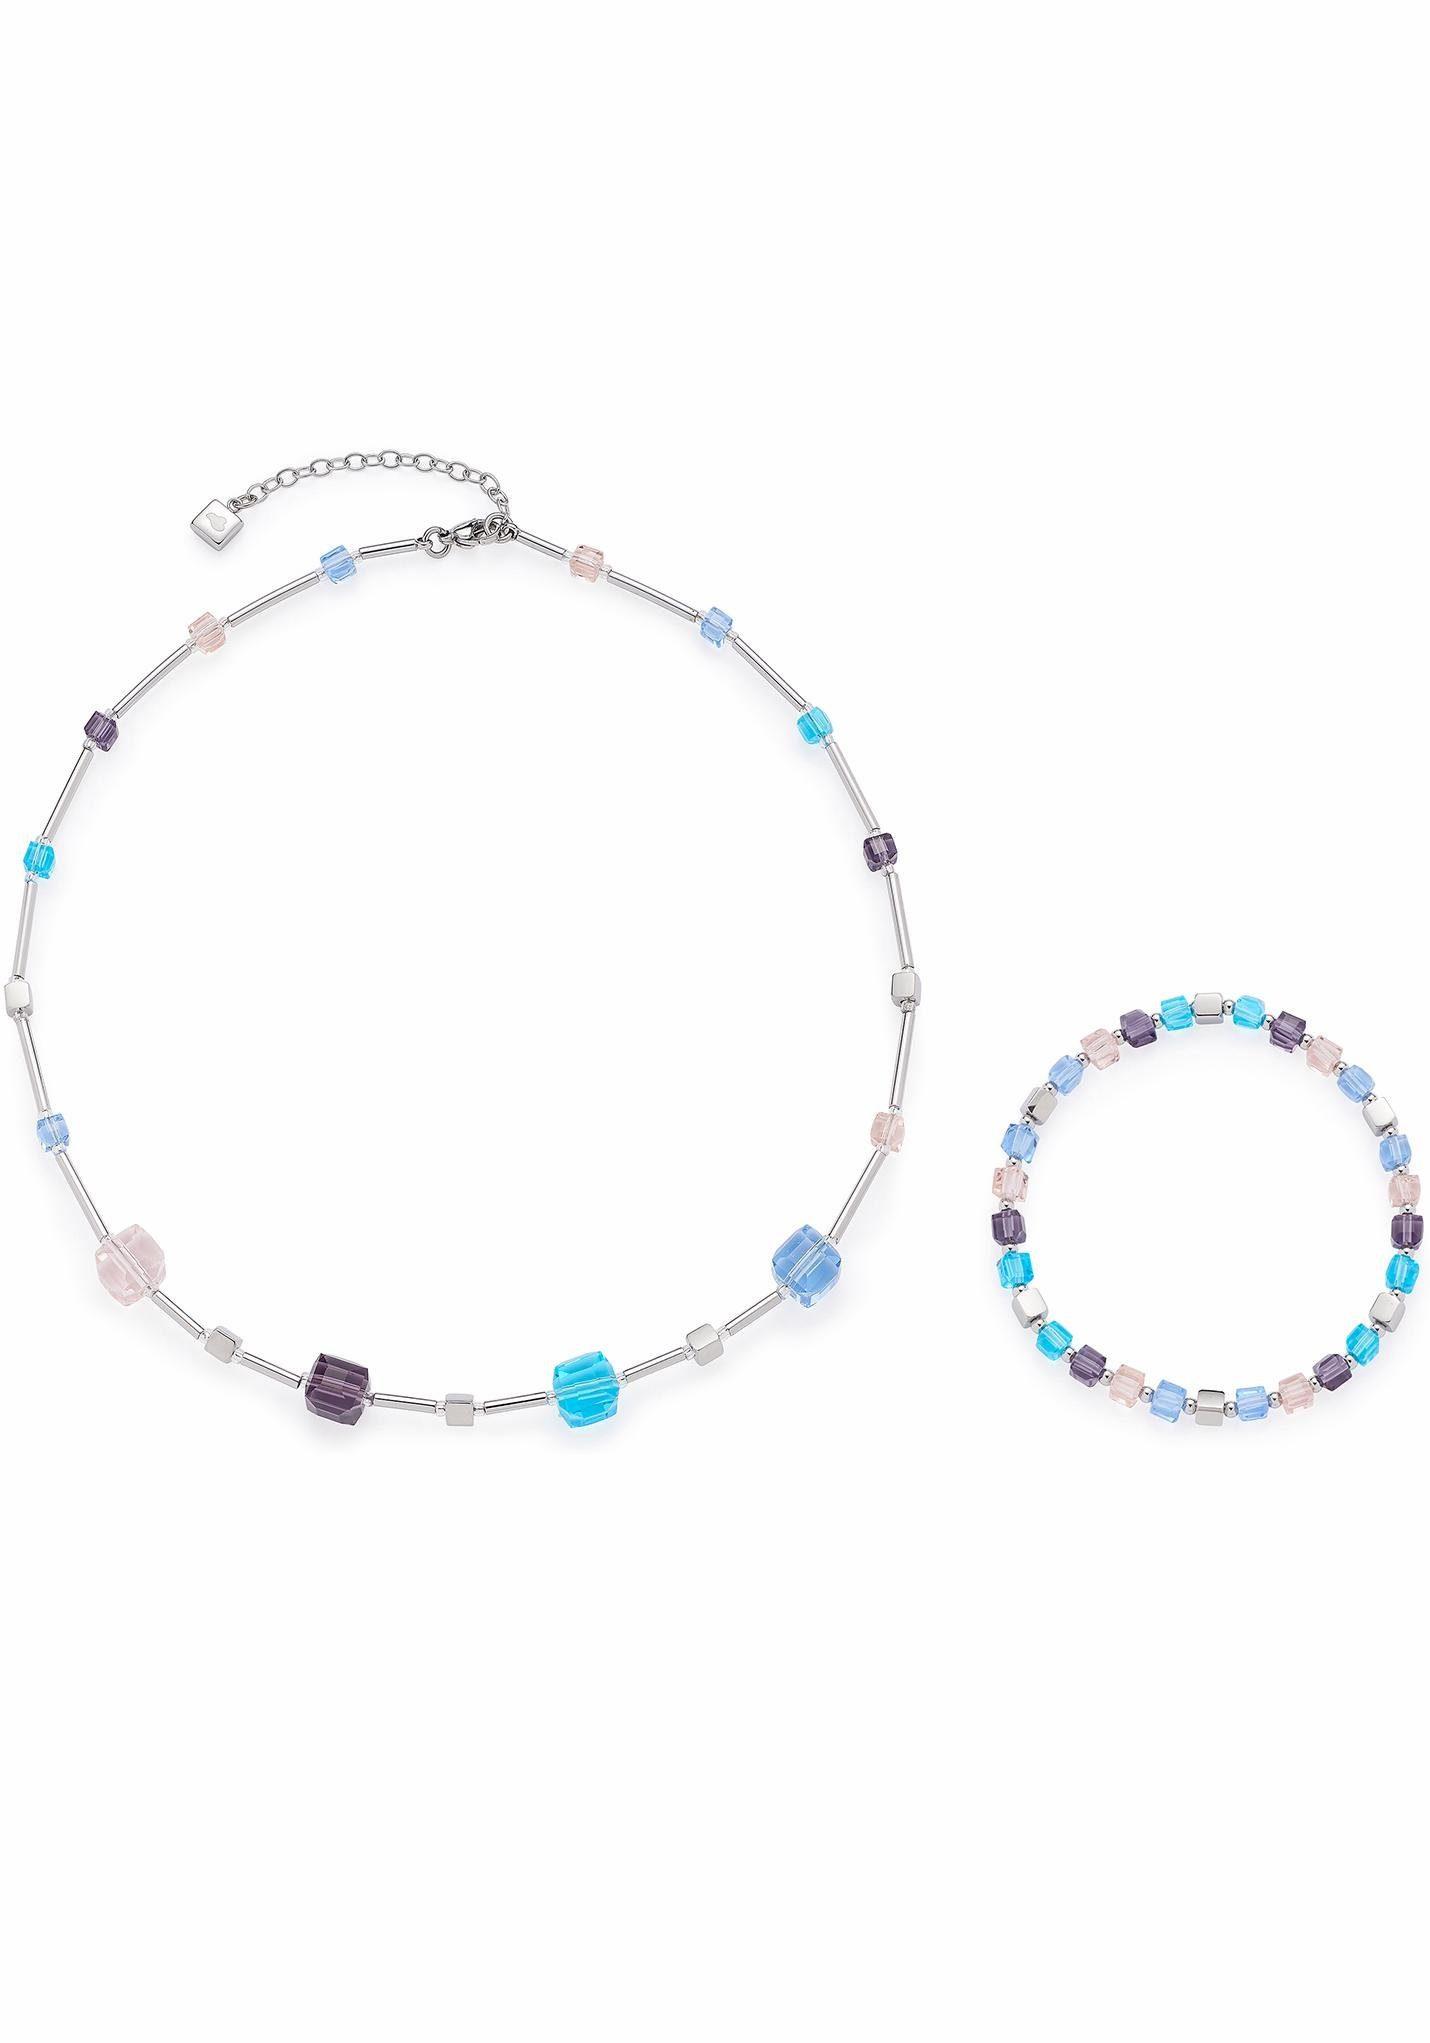 LEONARDO Ketten und Armband Set »Set Halskette + Armband Cubetto multicolor, 016290« (Set, 2 tlg), mit Glassteinen